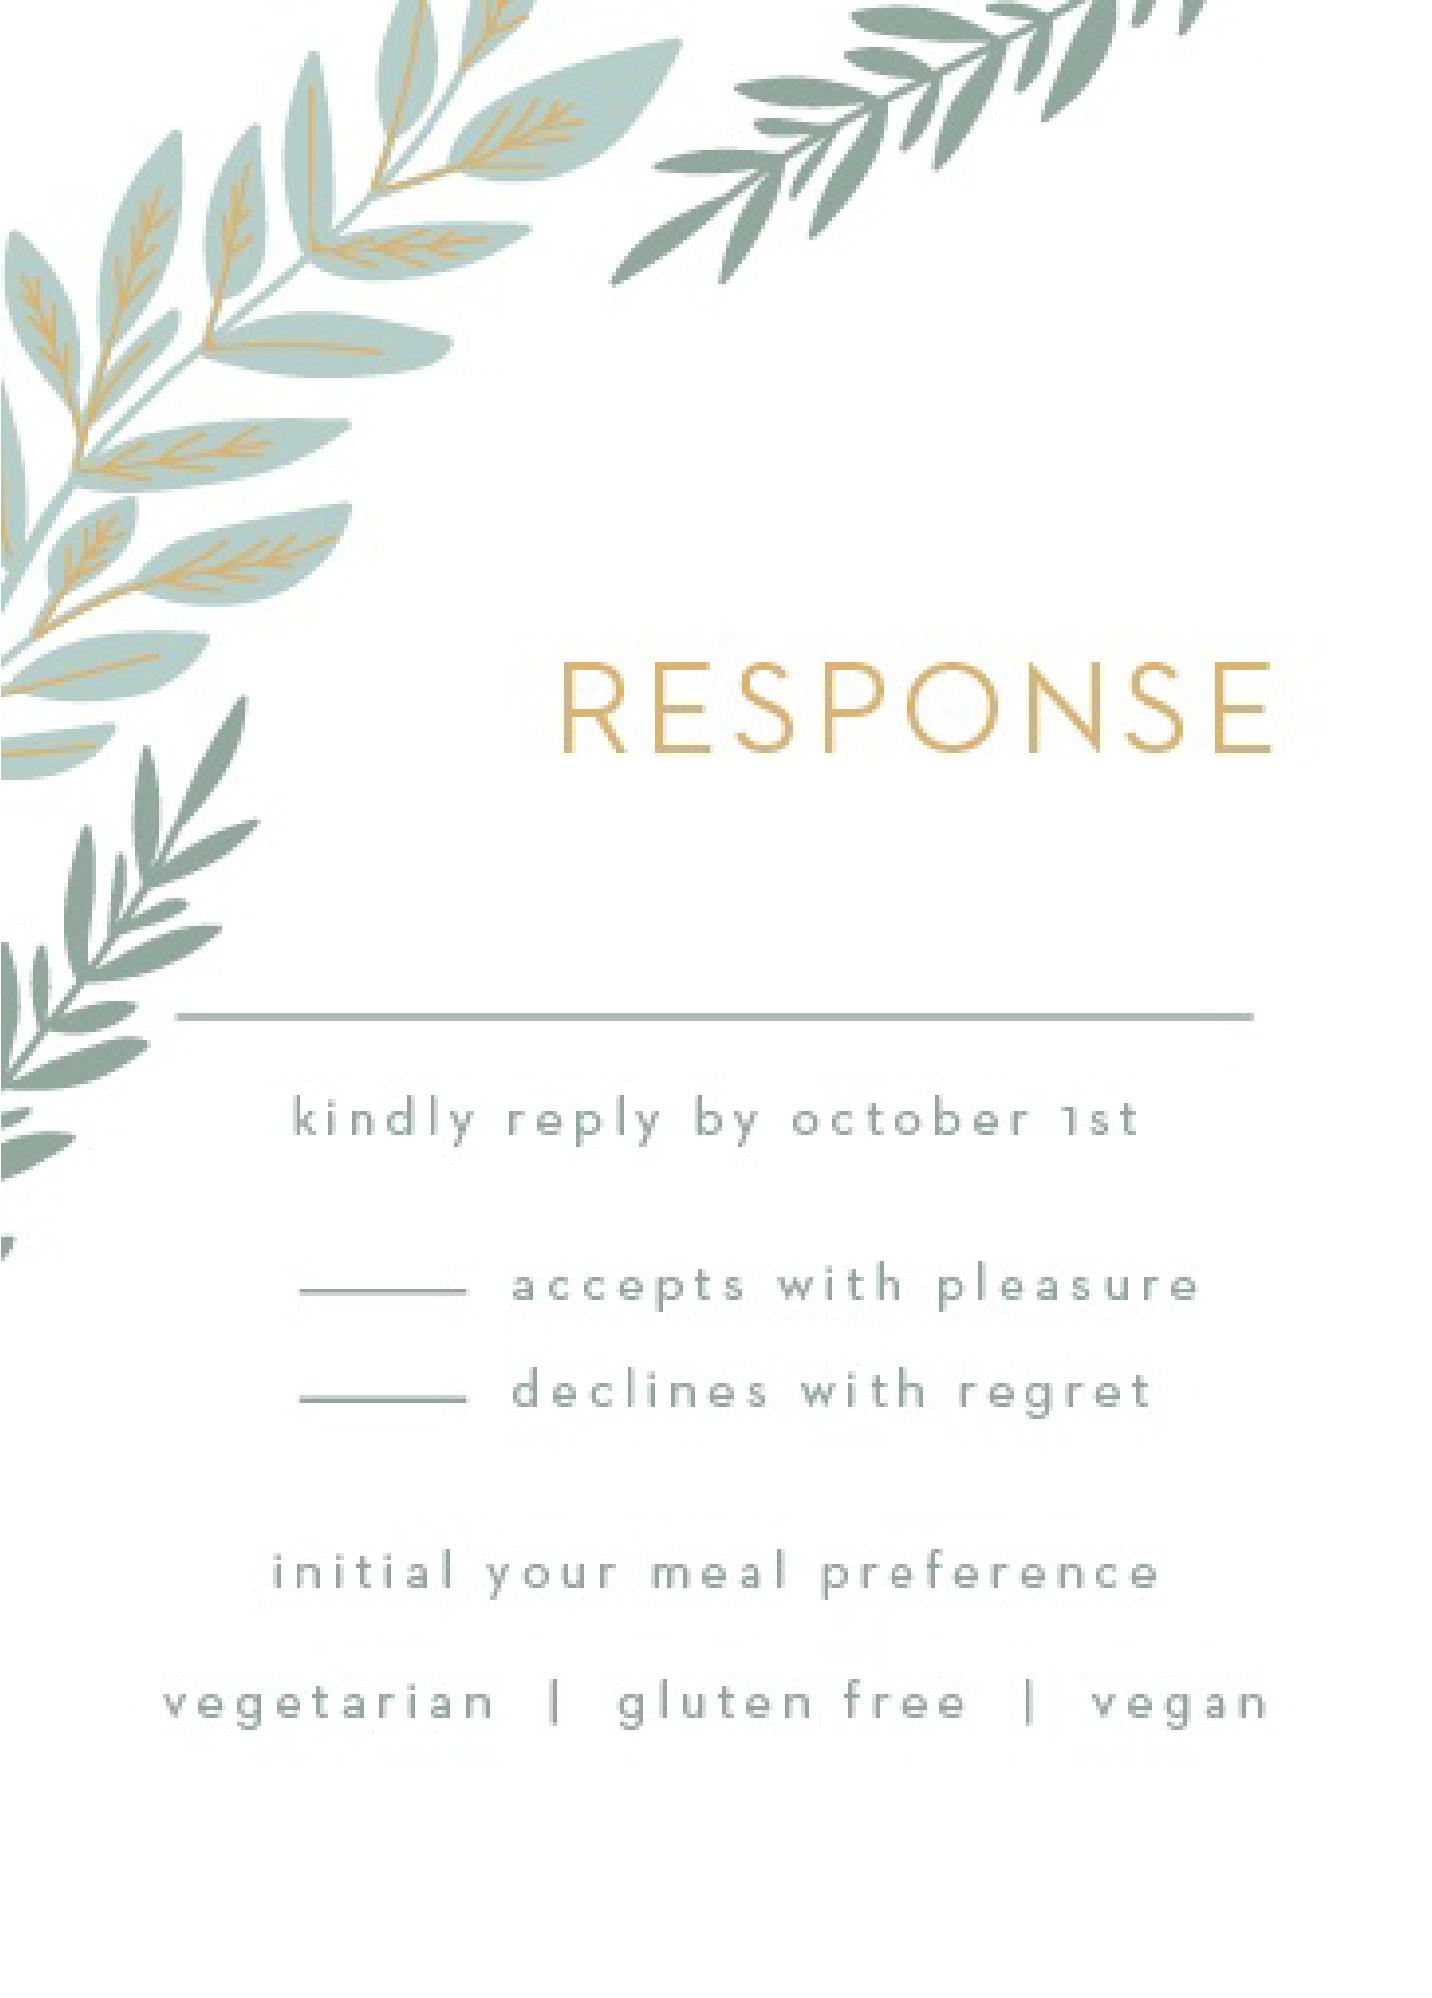 Wedding Response Card Wording.Response Card Wording